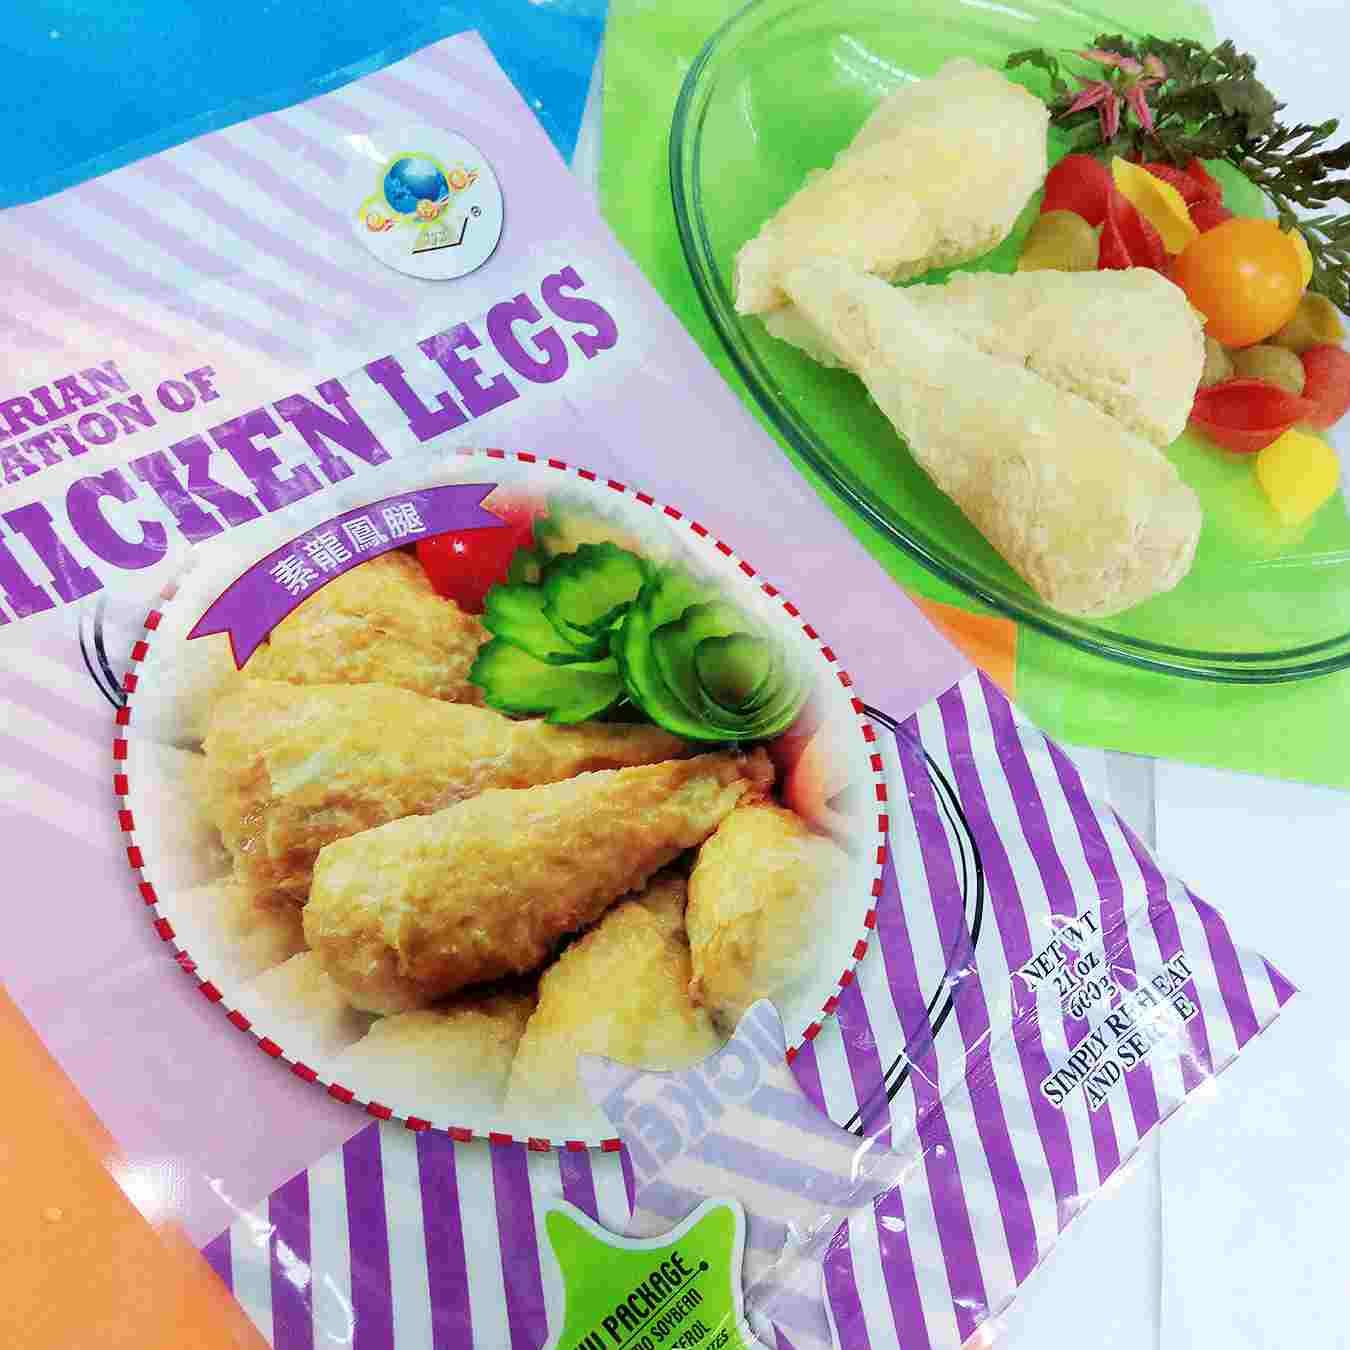 Image Vegetarian Chicken Leg 桔缘香 - 素龙凤腿 600grams